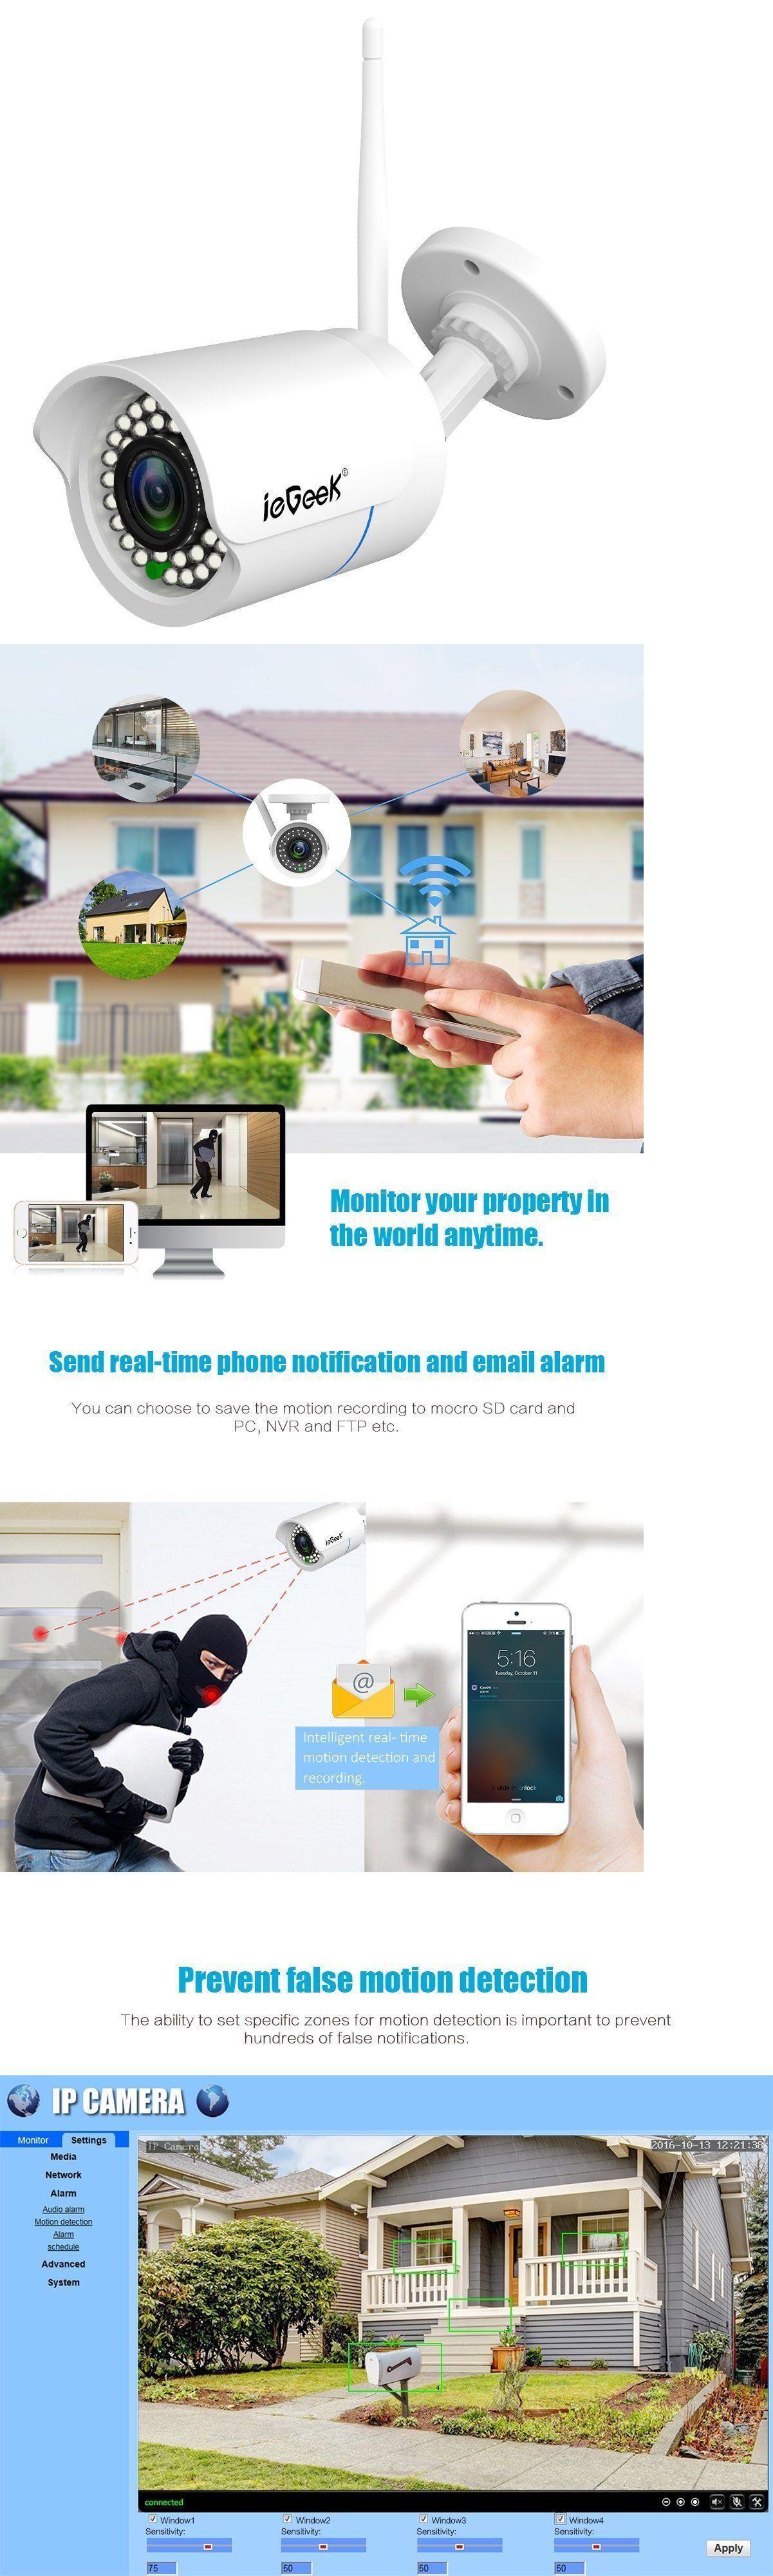 Security Cameras: Iegeek Wifi Wireless Security Camera Outdoor Ip ...